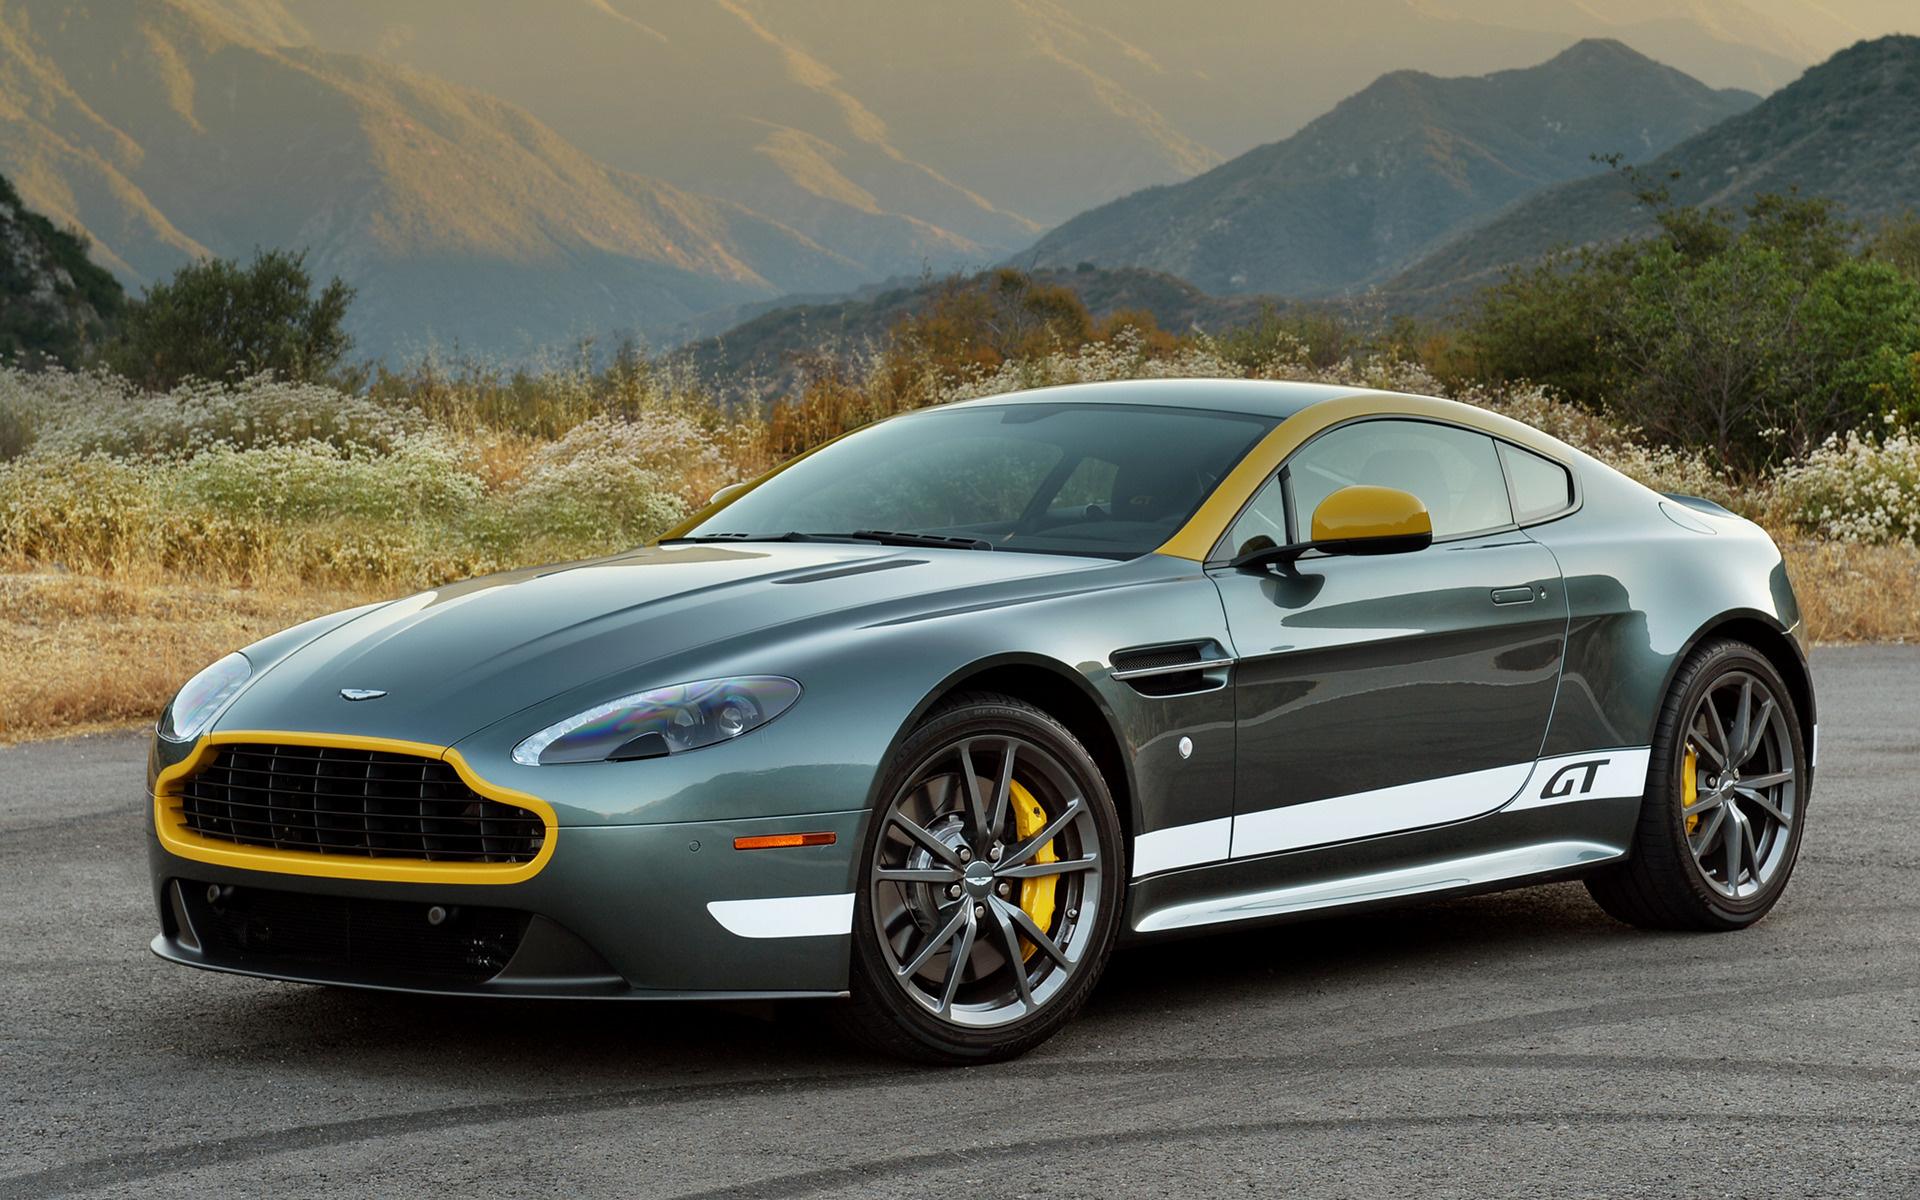 2014 Aston Martin V8 Vantage Gt Us Wallpapers And Hd Images Car Pixel